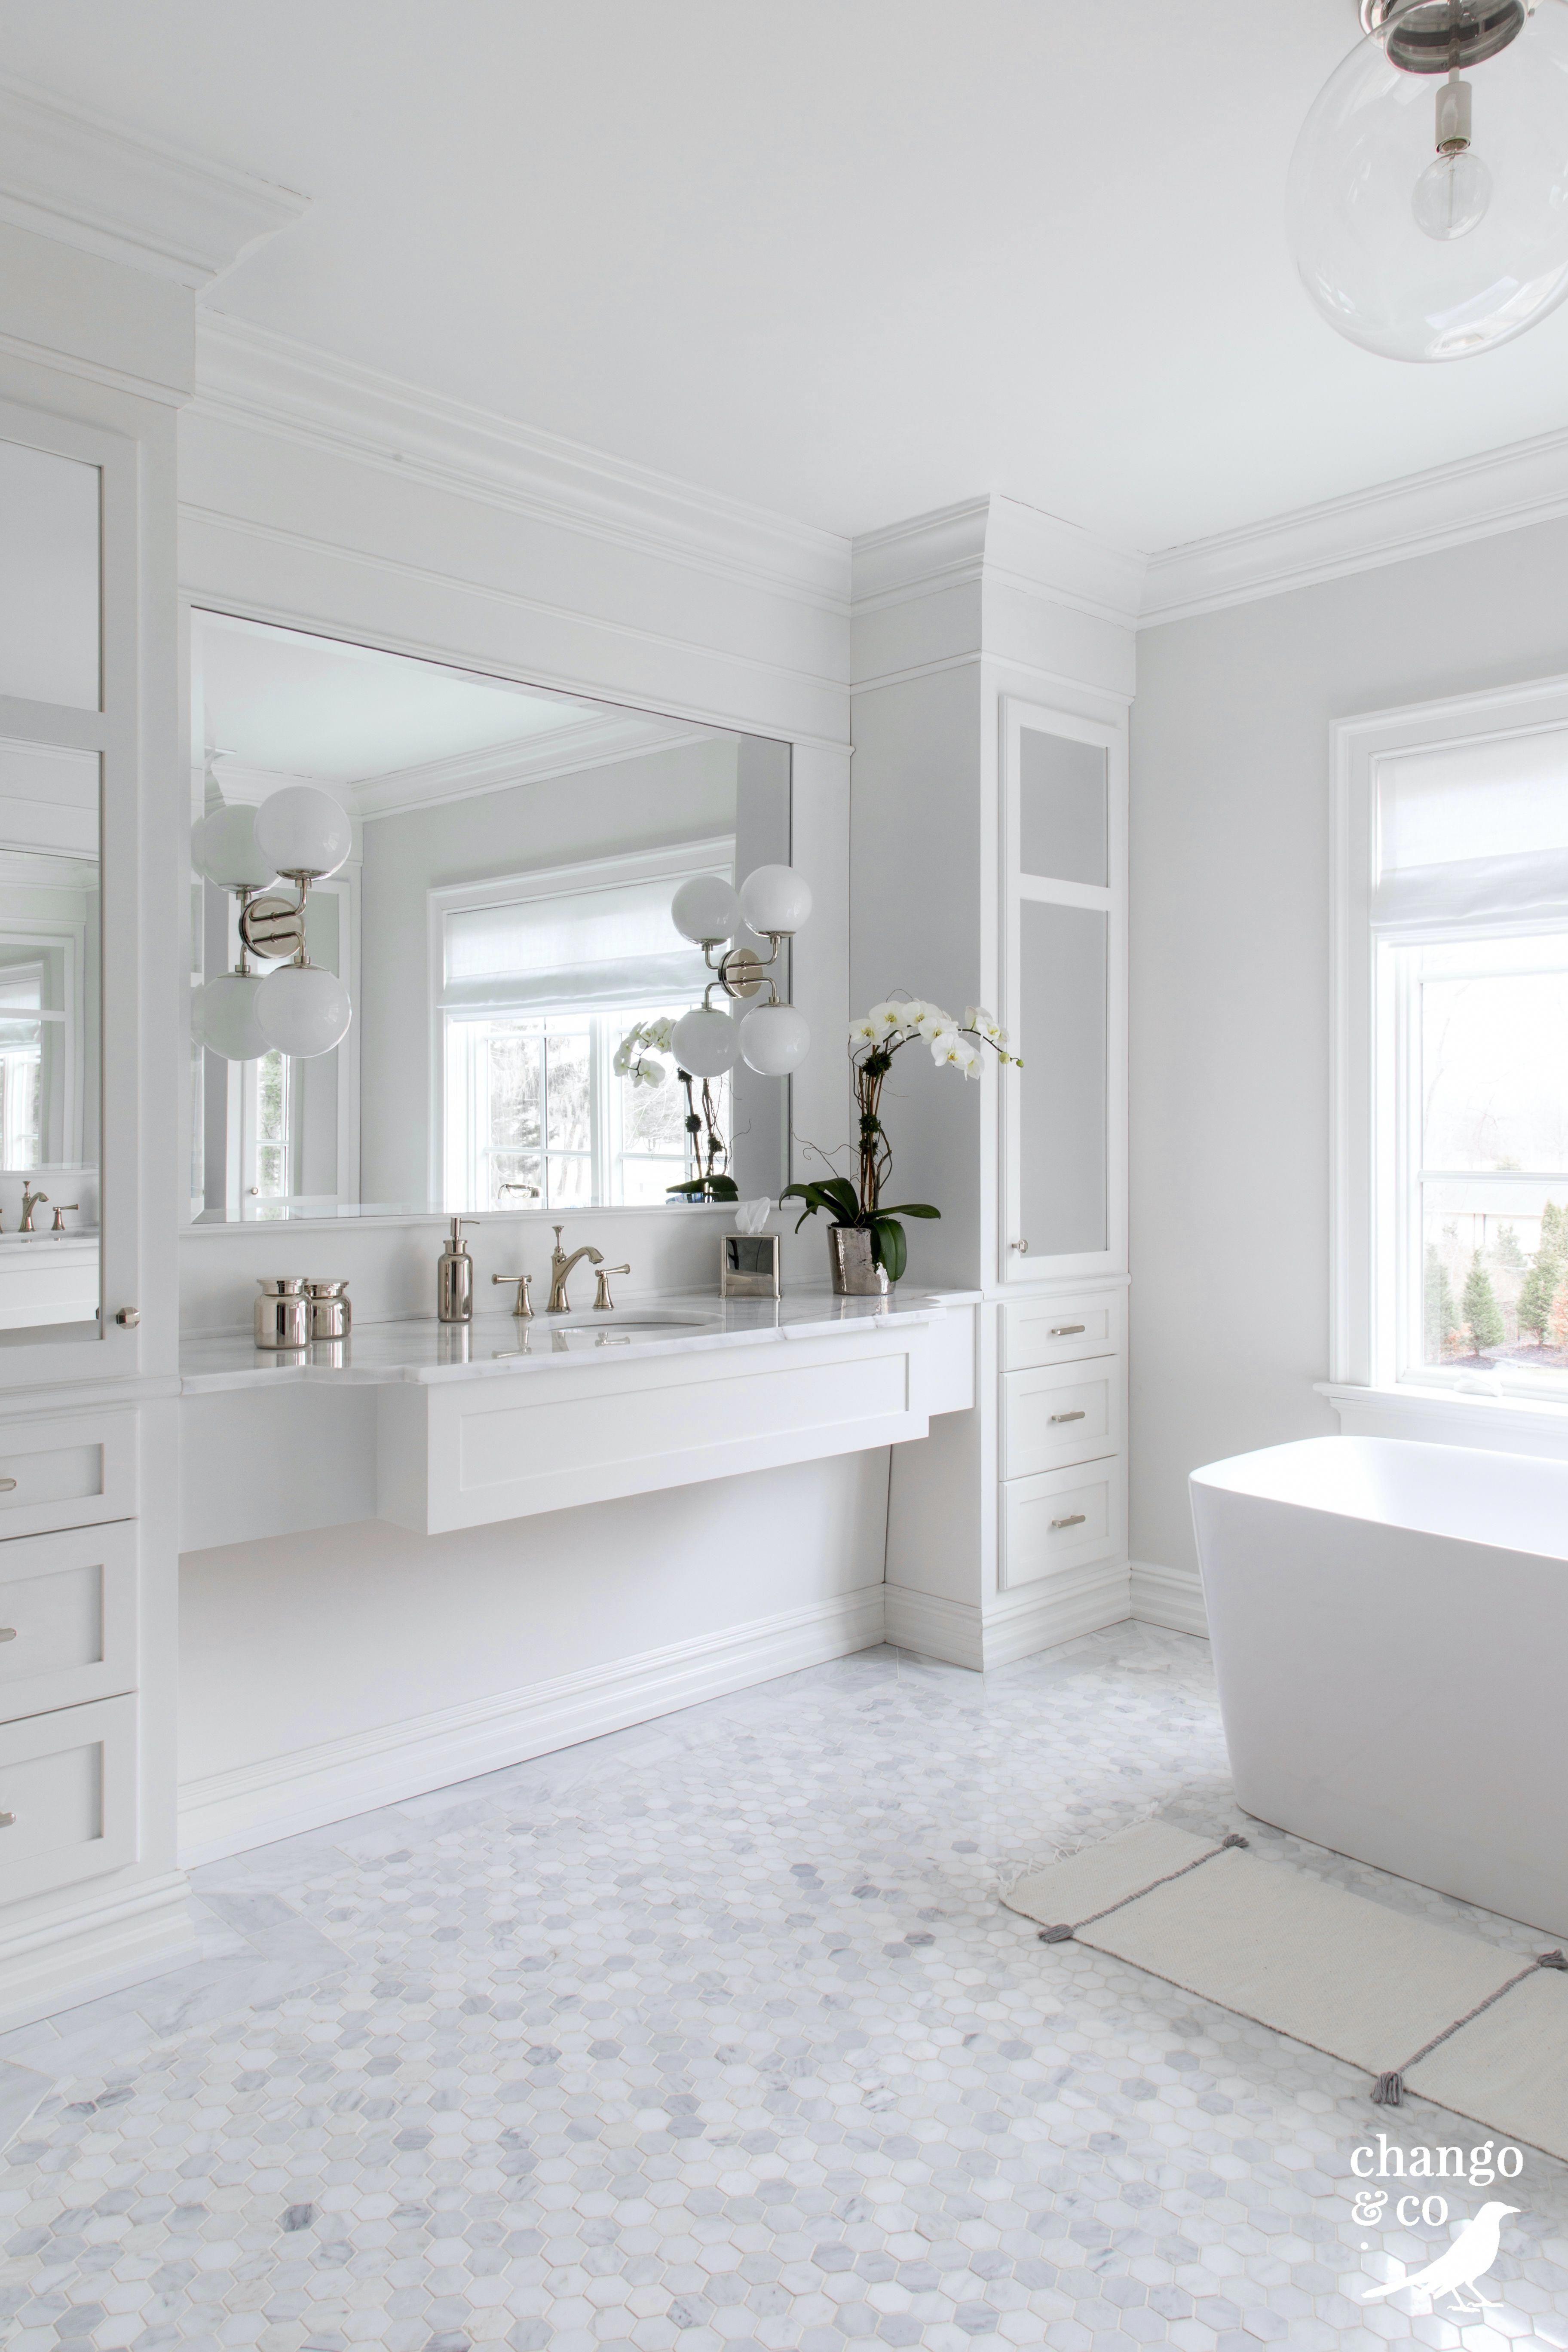 Bathroom Ideas Storage Luxurybathroomorganizer White Bathroom Designs Bathroom Interior Design All White Bathroom